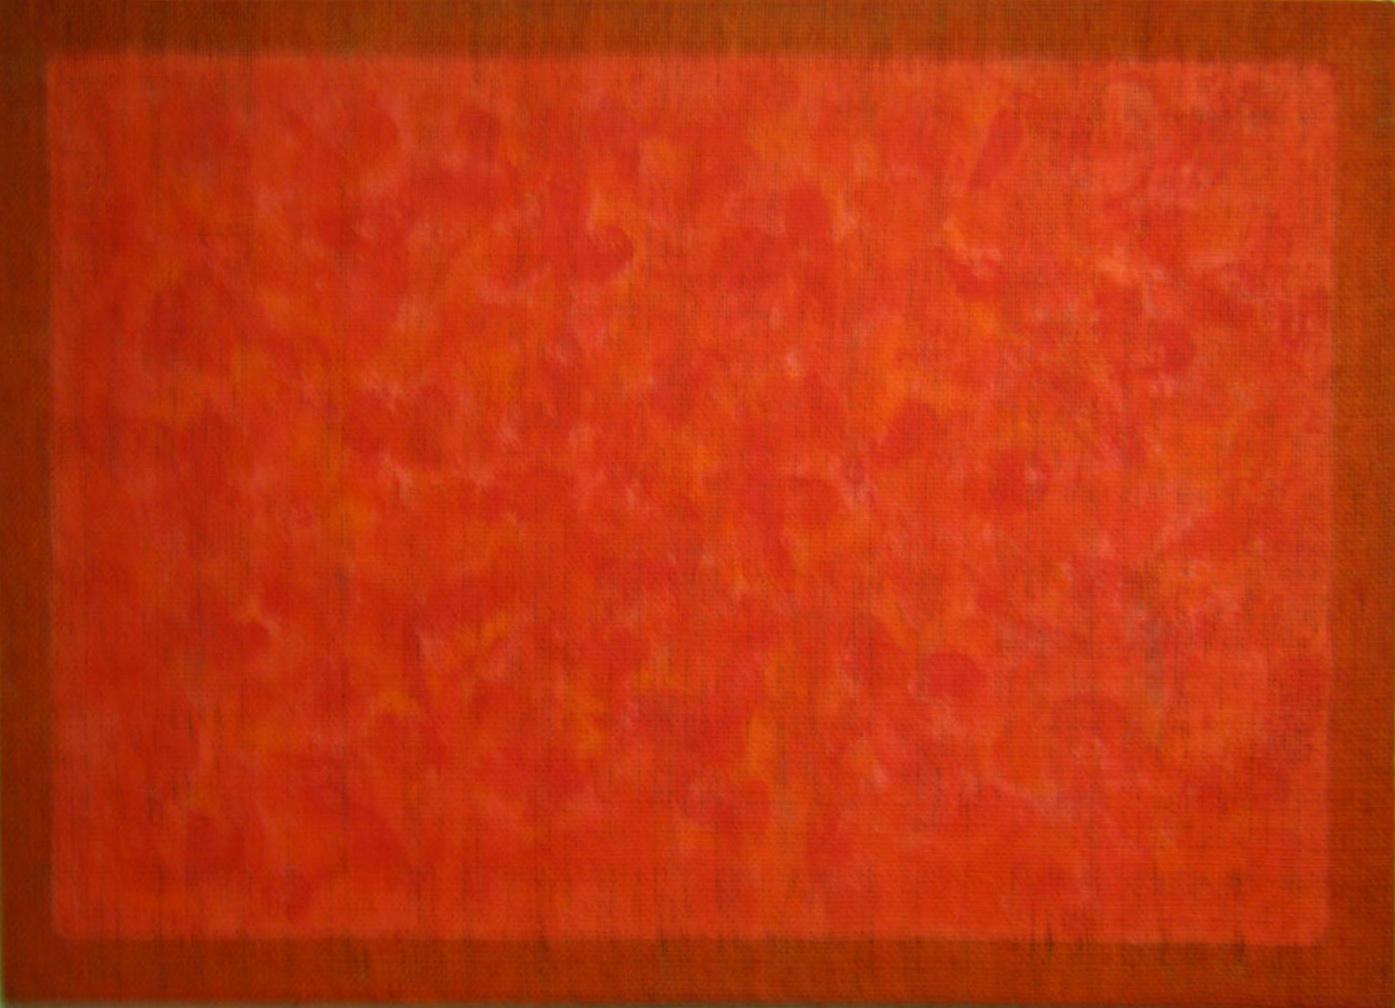 Pintura de Amelia Toledo 100x140cm - VENDIDO